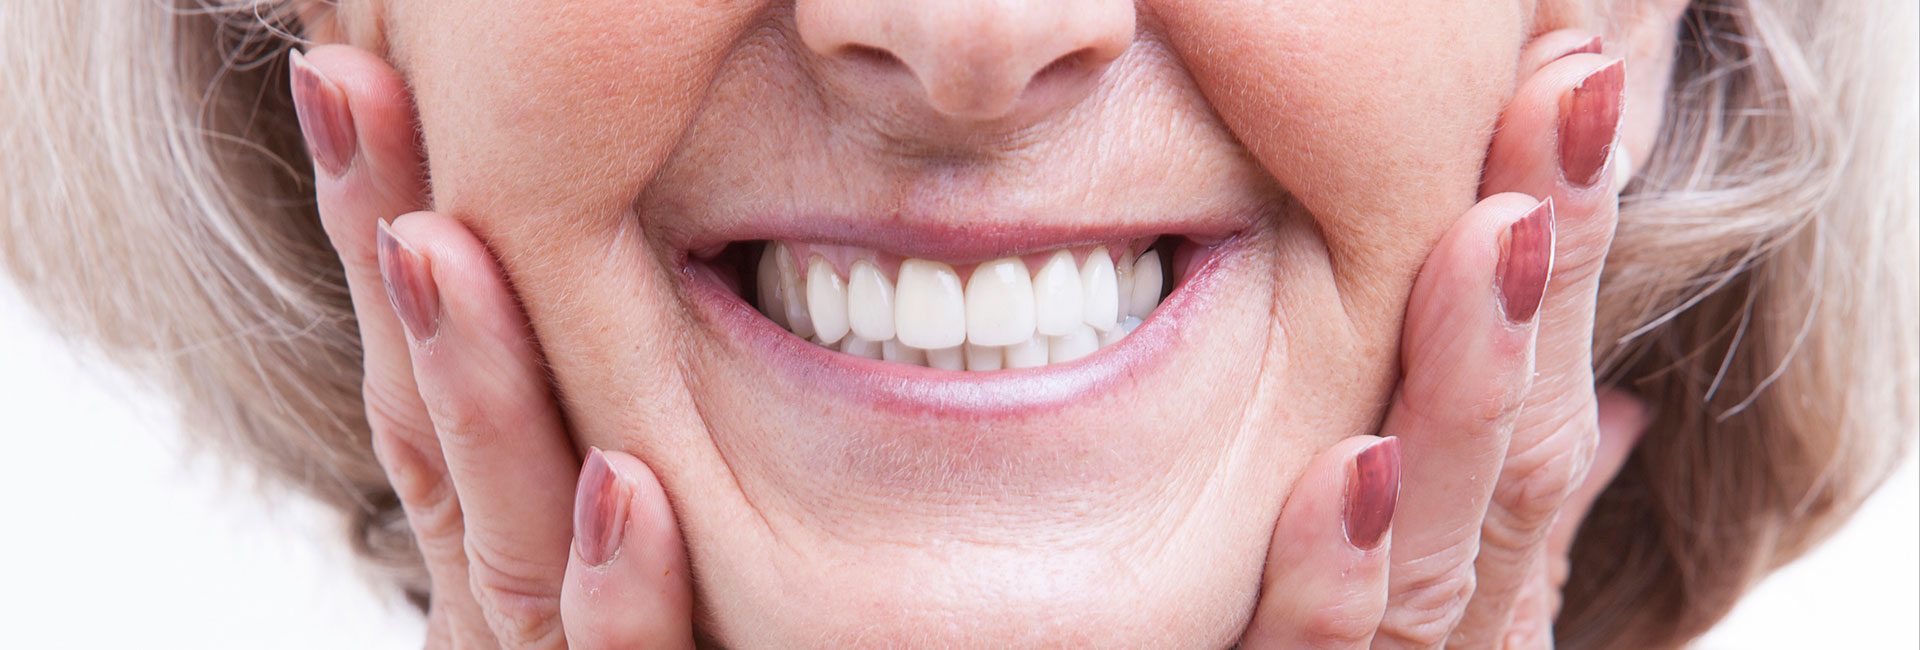 Happy elderly woman with dentures